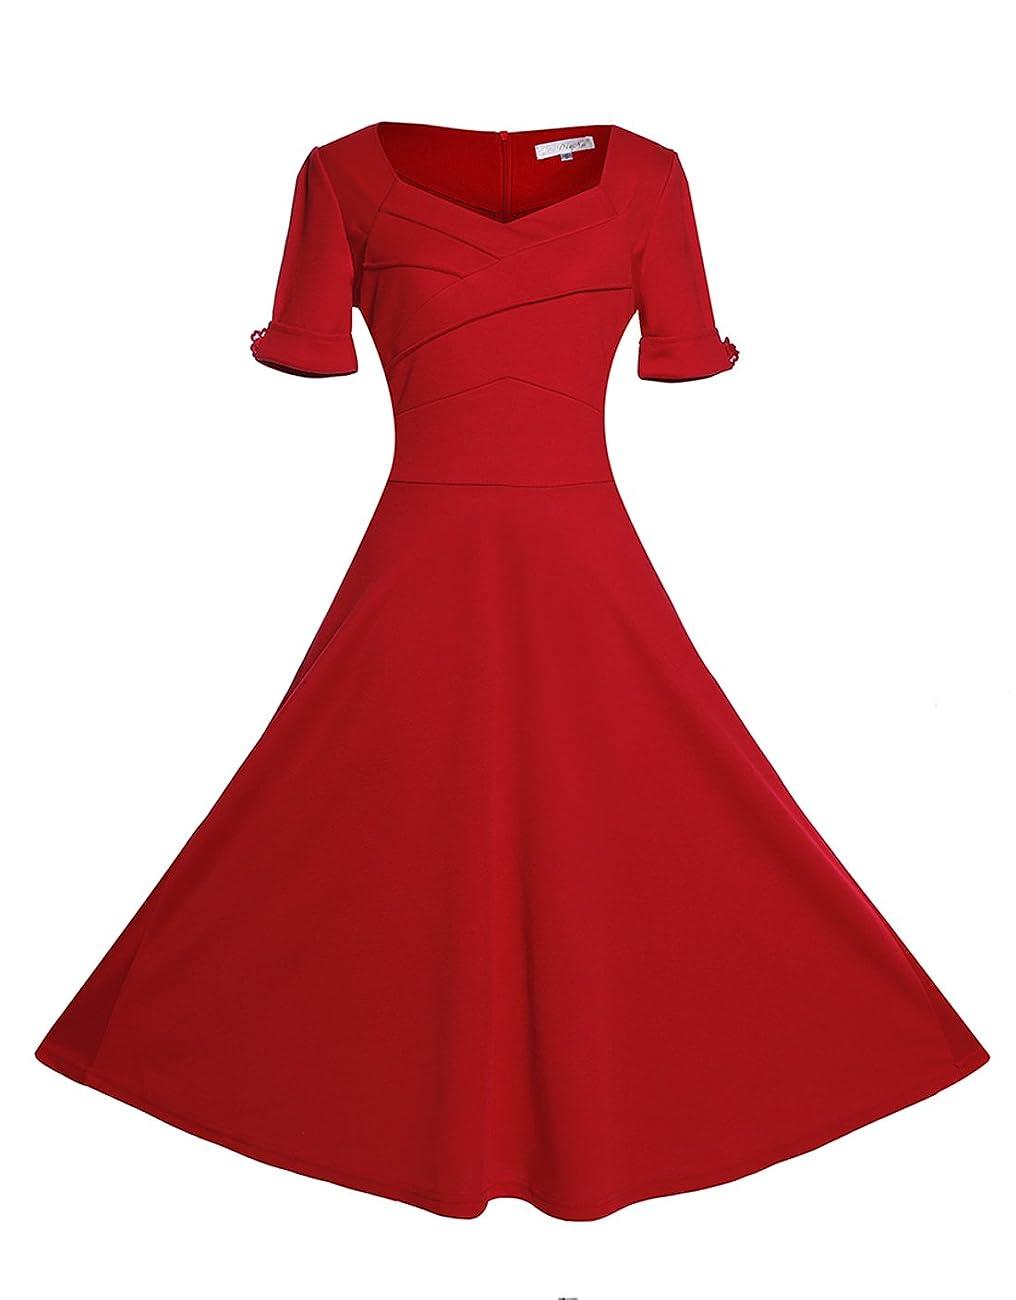 Relipop Women's Vintage V-neck Half Sleeve Dress Casual A-line Dresses 0